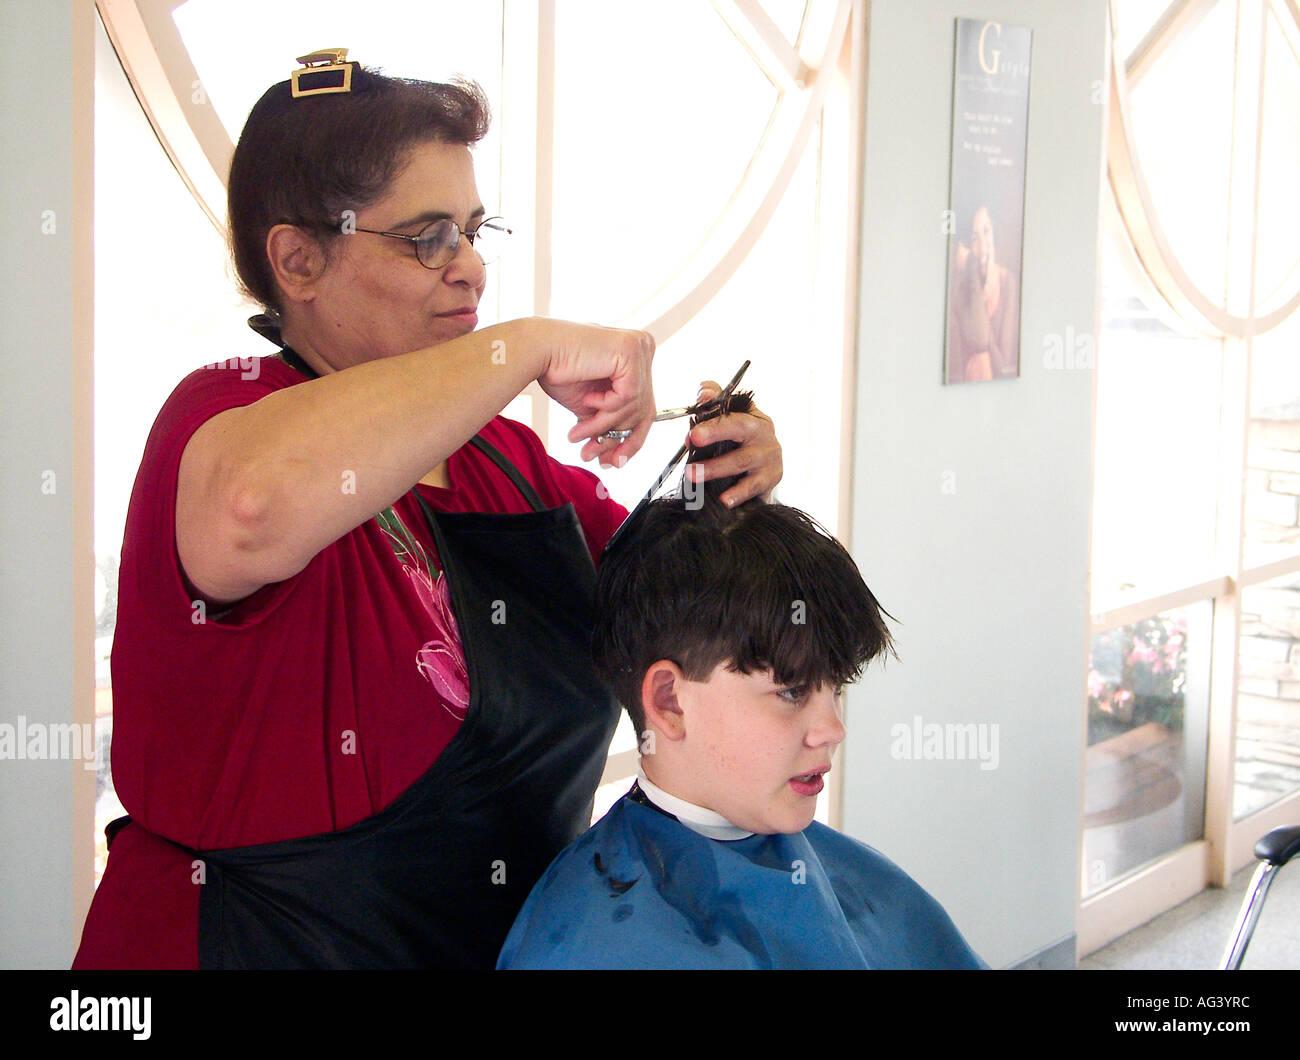 Teen White Boy Gets Haircut By Female Barber Usa Stock